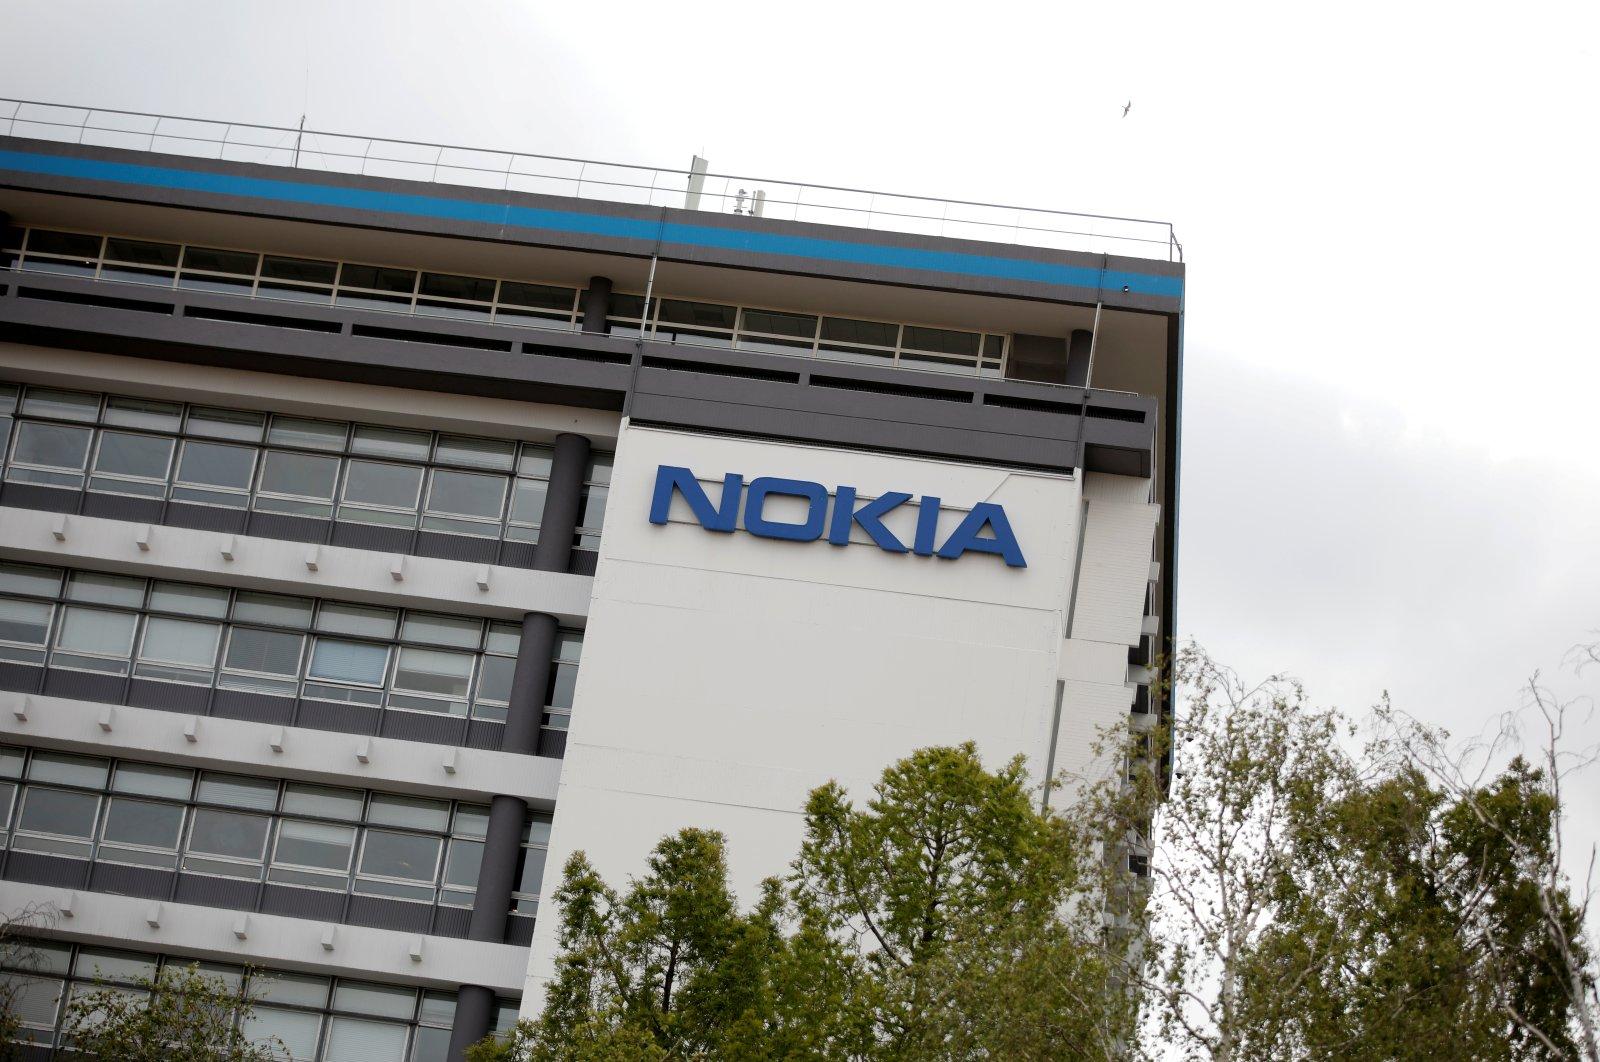 The Nokia logo is displayed at the Nokia Paris-Saclay campus in Nozay, near Paris, France, June 30, 2020. (Reuters Photo)